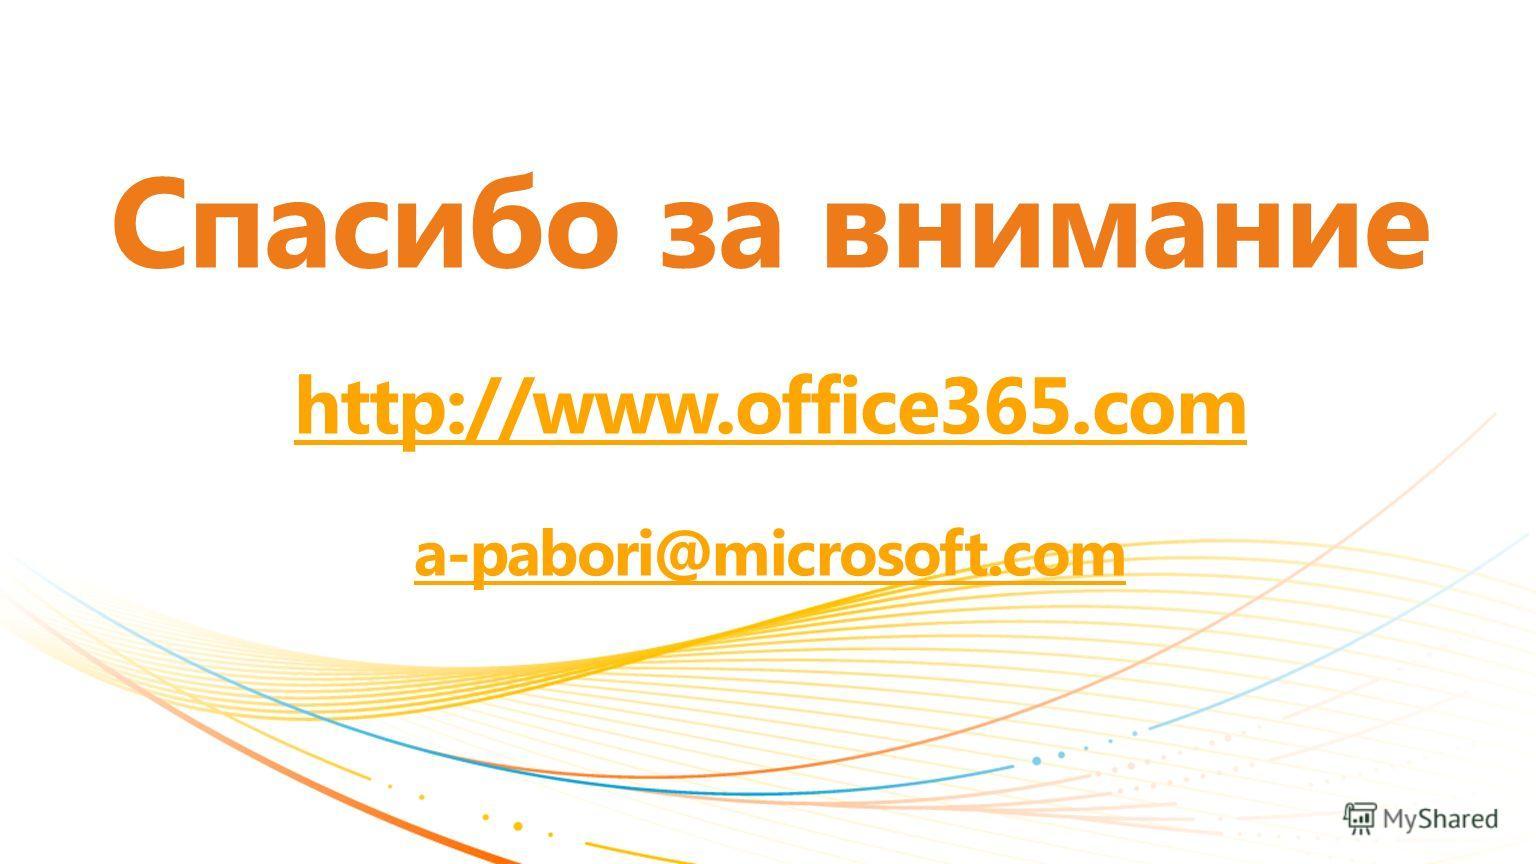 Спасибо за внимание http://www.office365. com a-pabori@microsoft.com http://www.office365. com a-pabori@microsoft.com